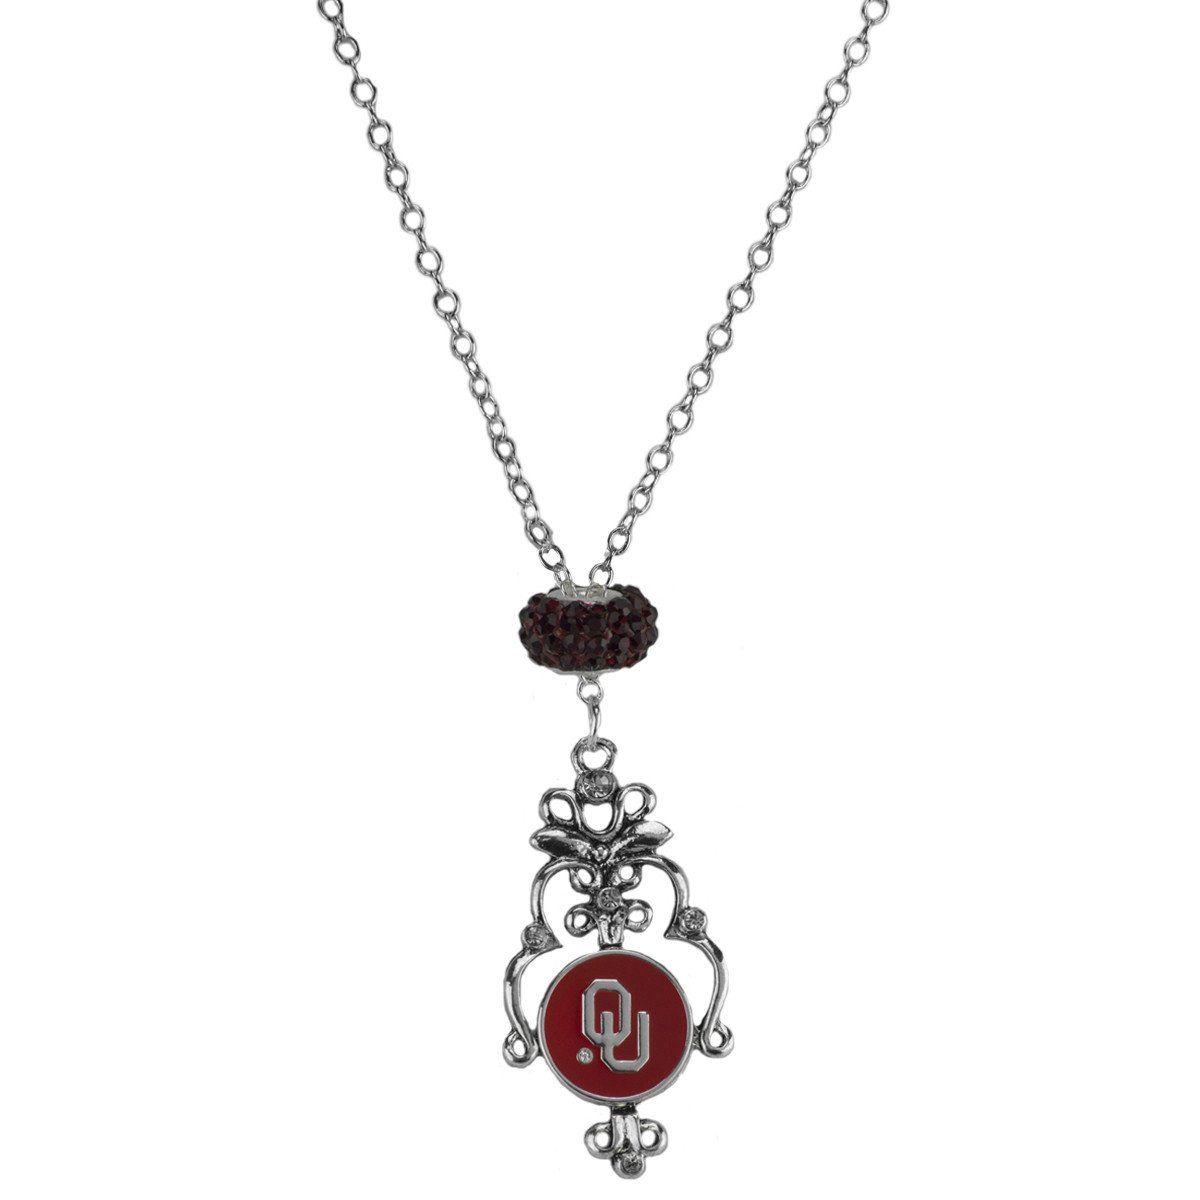 Oklahoma Sooners - Filigree Necklace